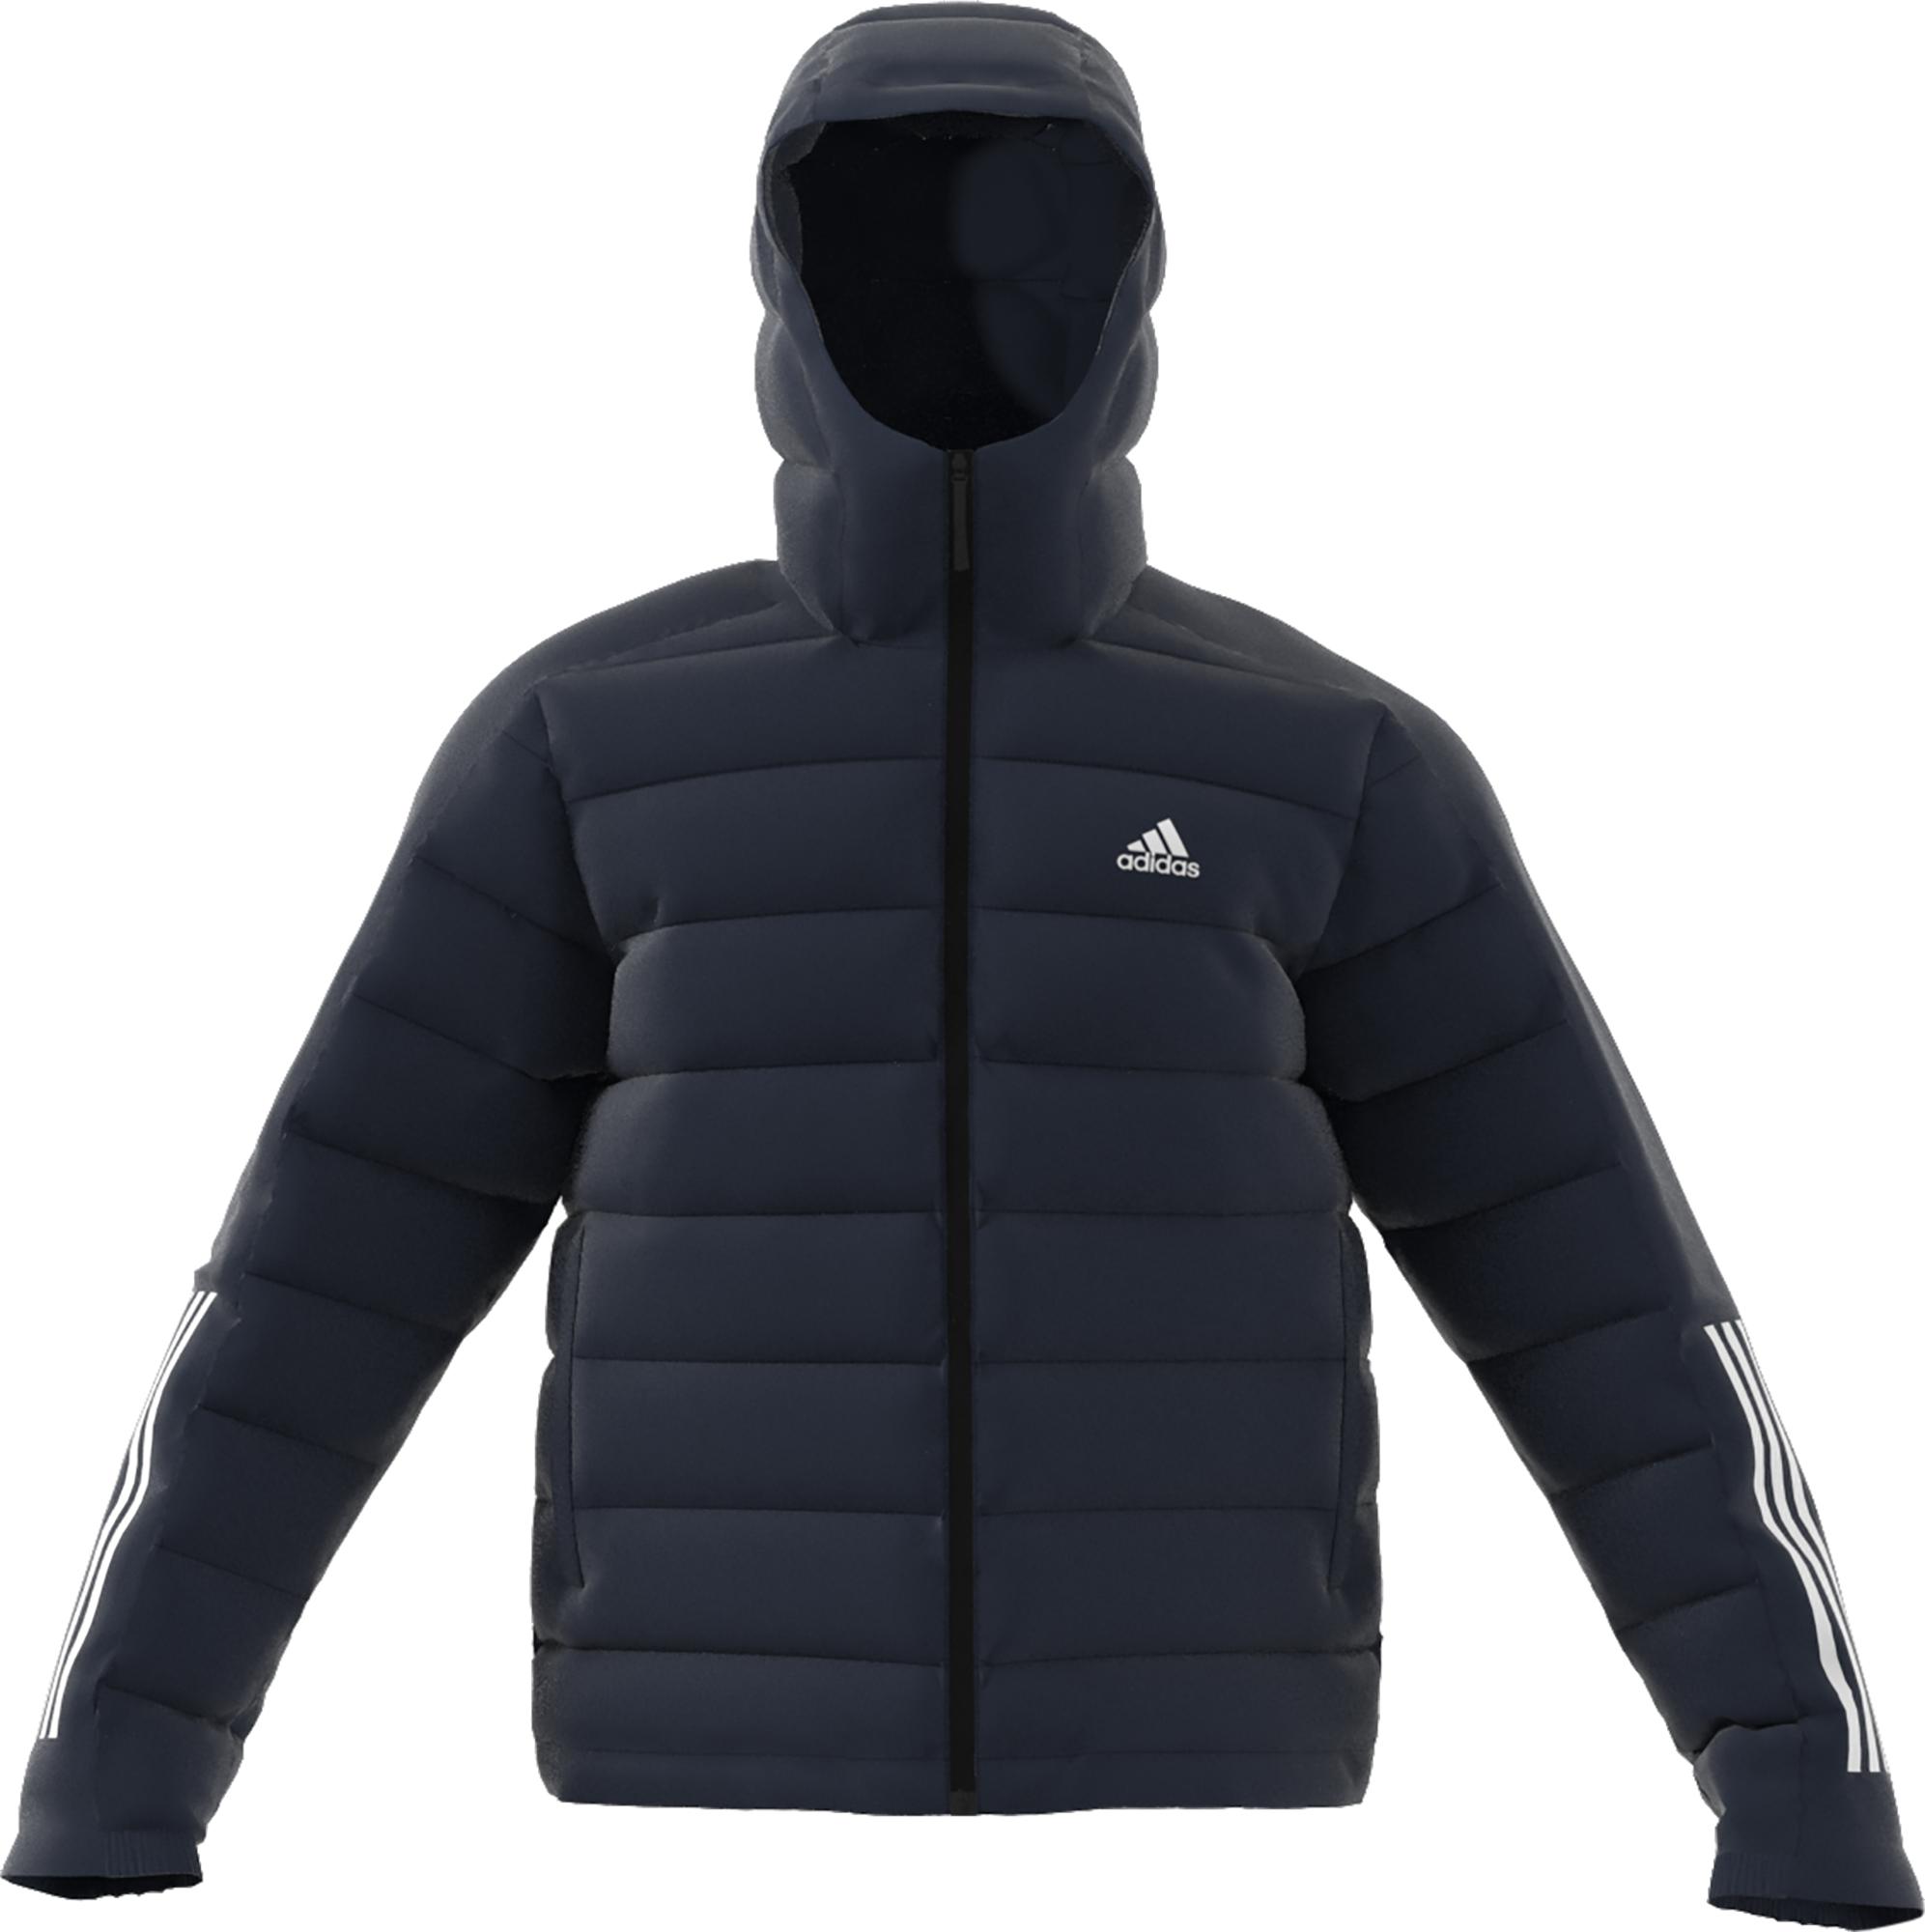 Adidas Куртка утепленная мужская adidas Itavic 3-Stripes 2.0, размер 52-54 adidas куртка утепленная женская adidas helionic размер 52 54